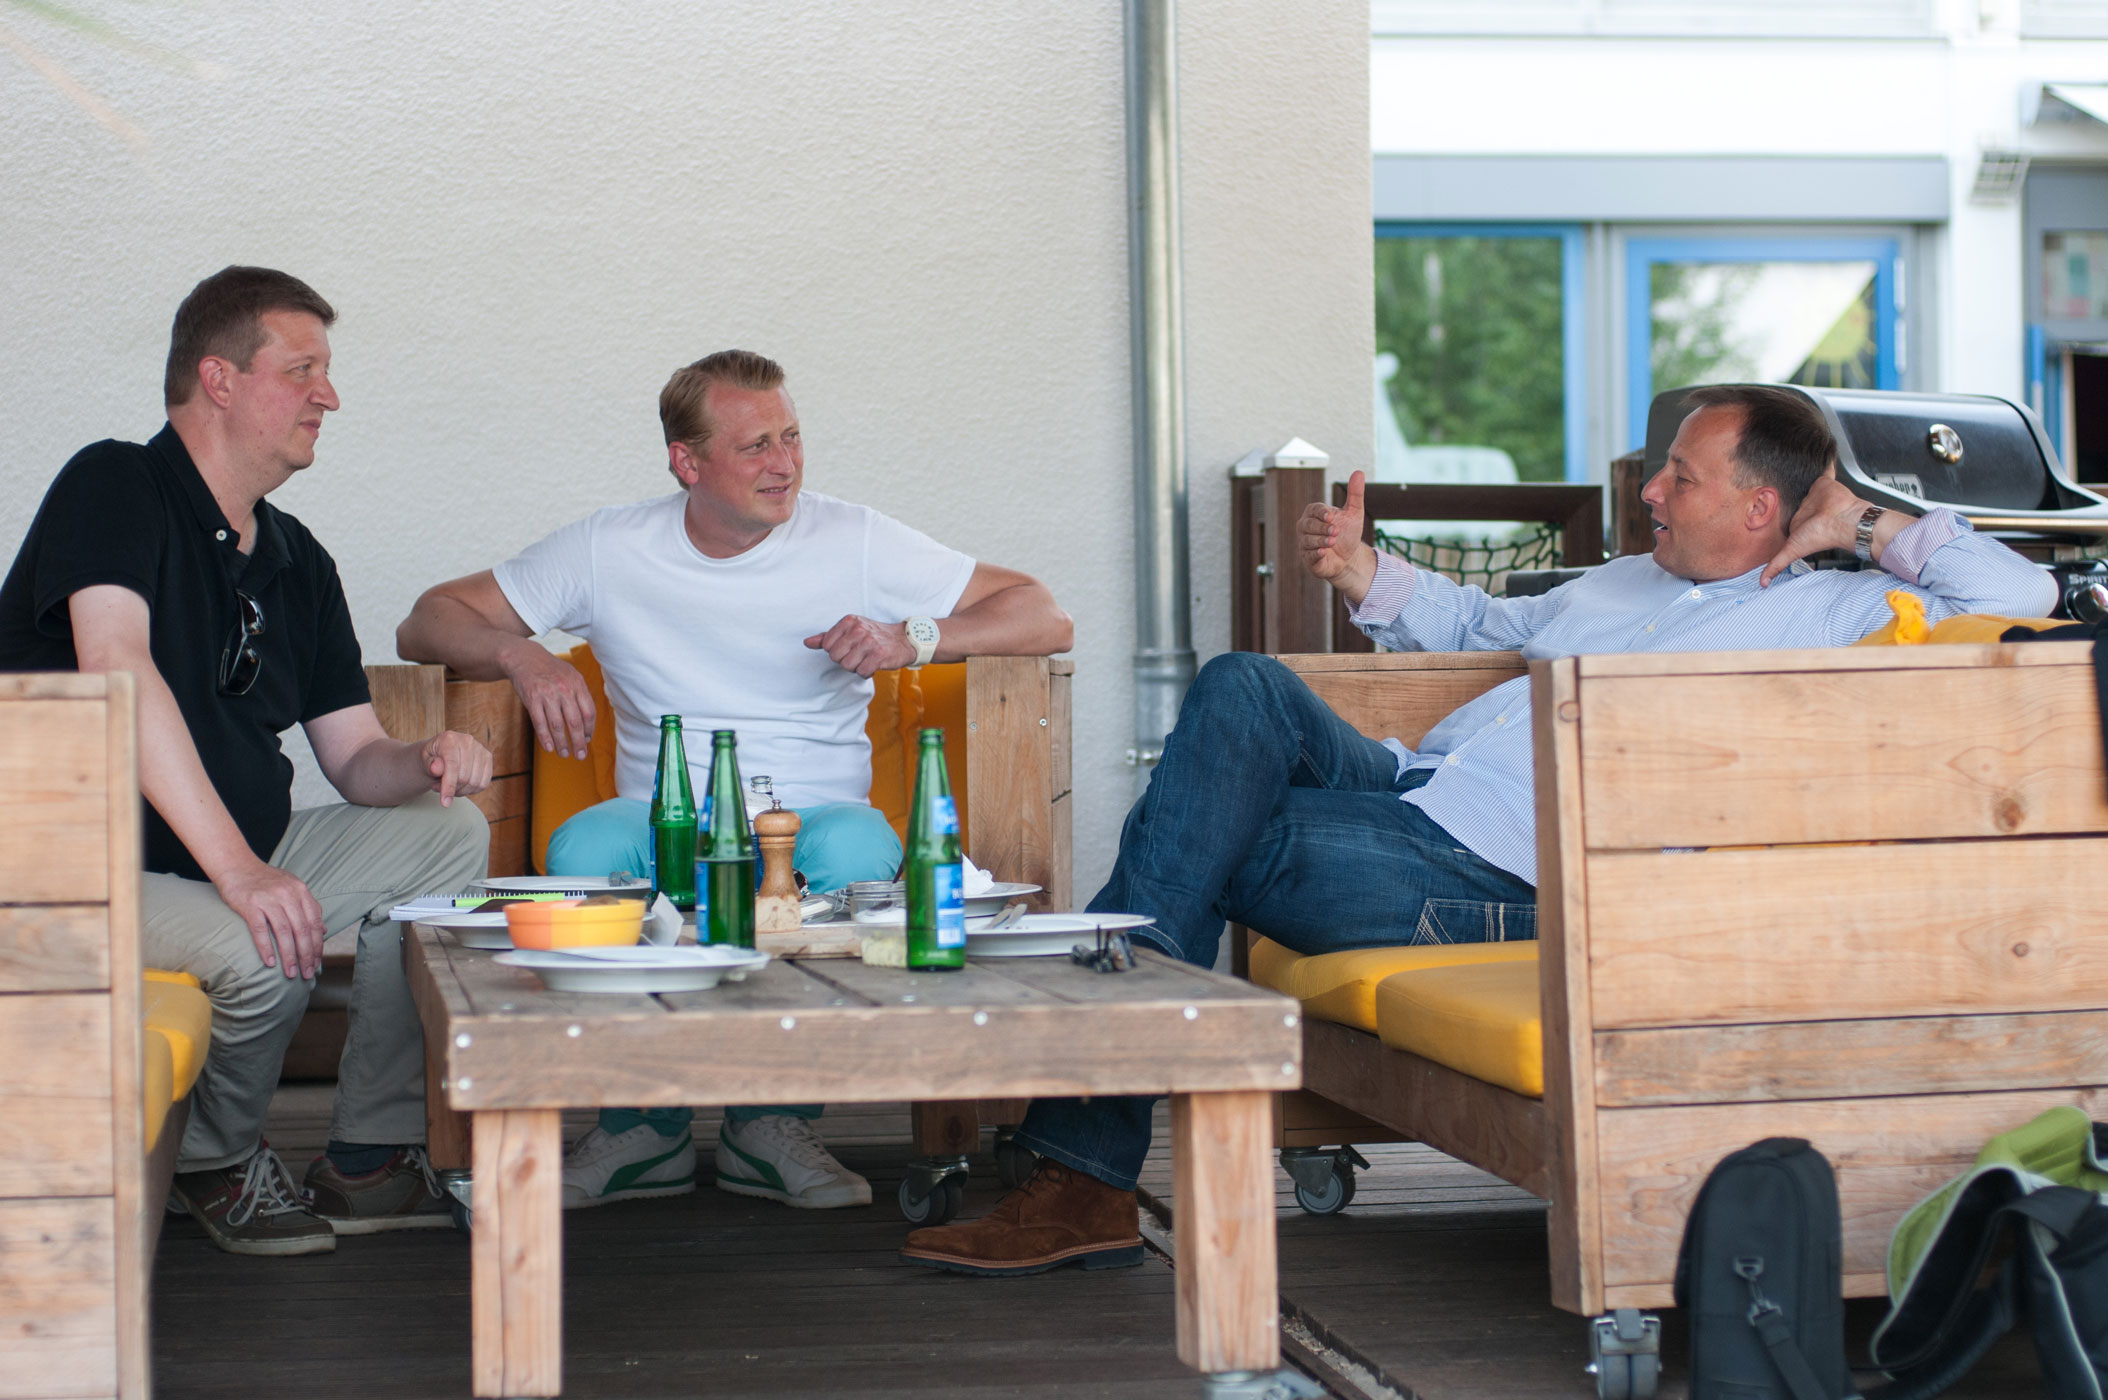 KR-ONE Kocht - Mit Jörg Heydel im Uerdinger Beachclub